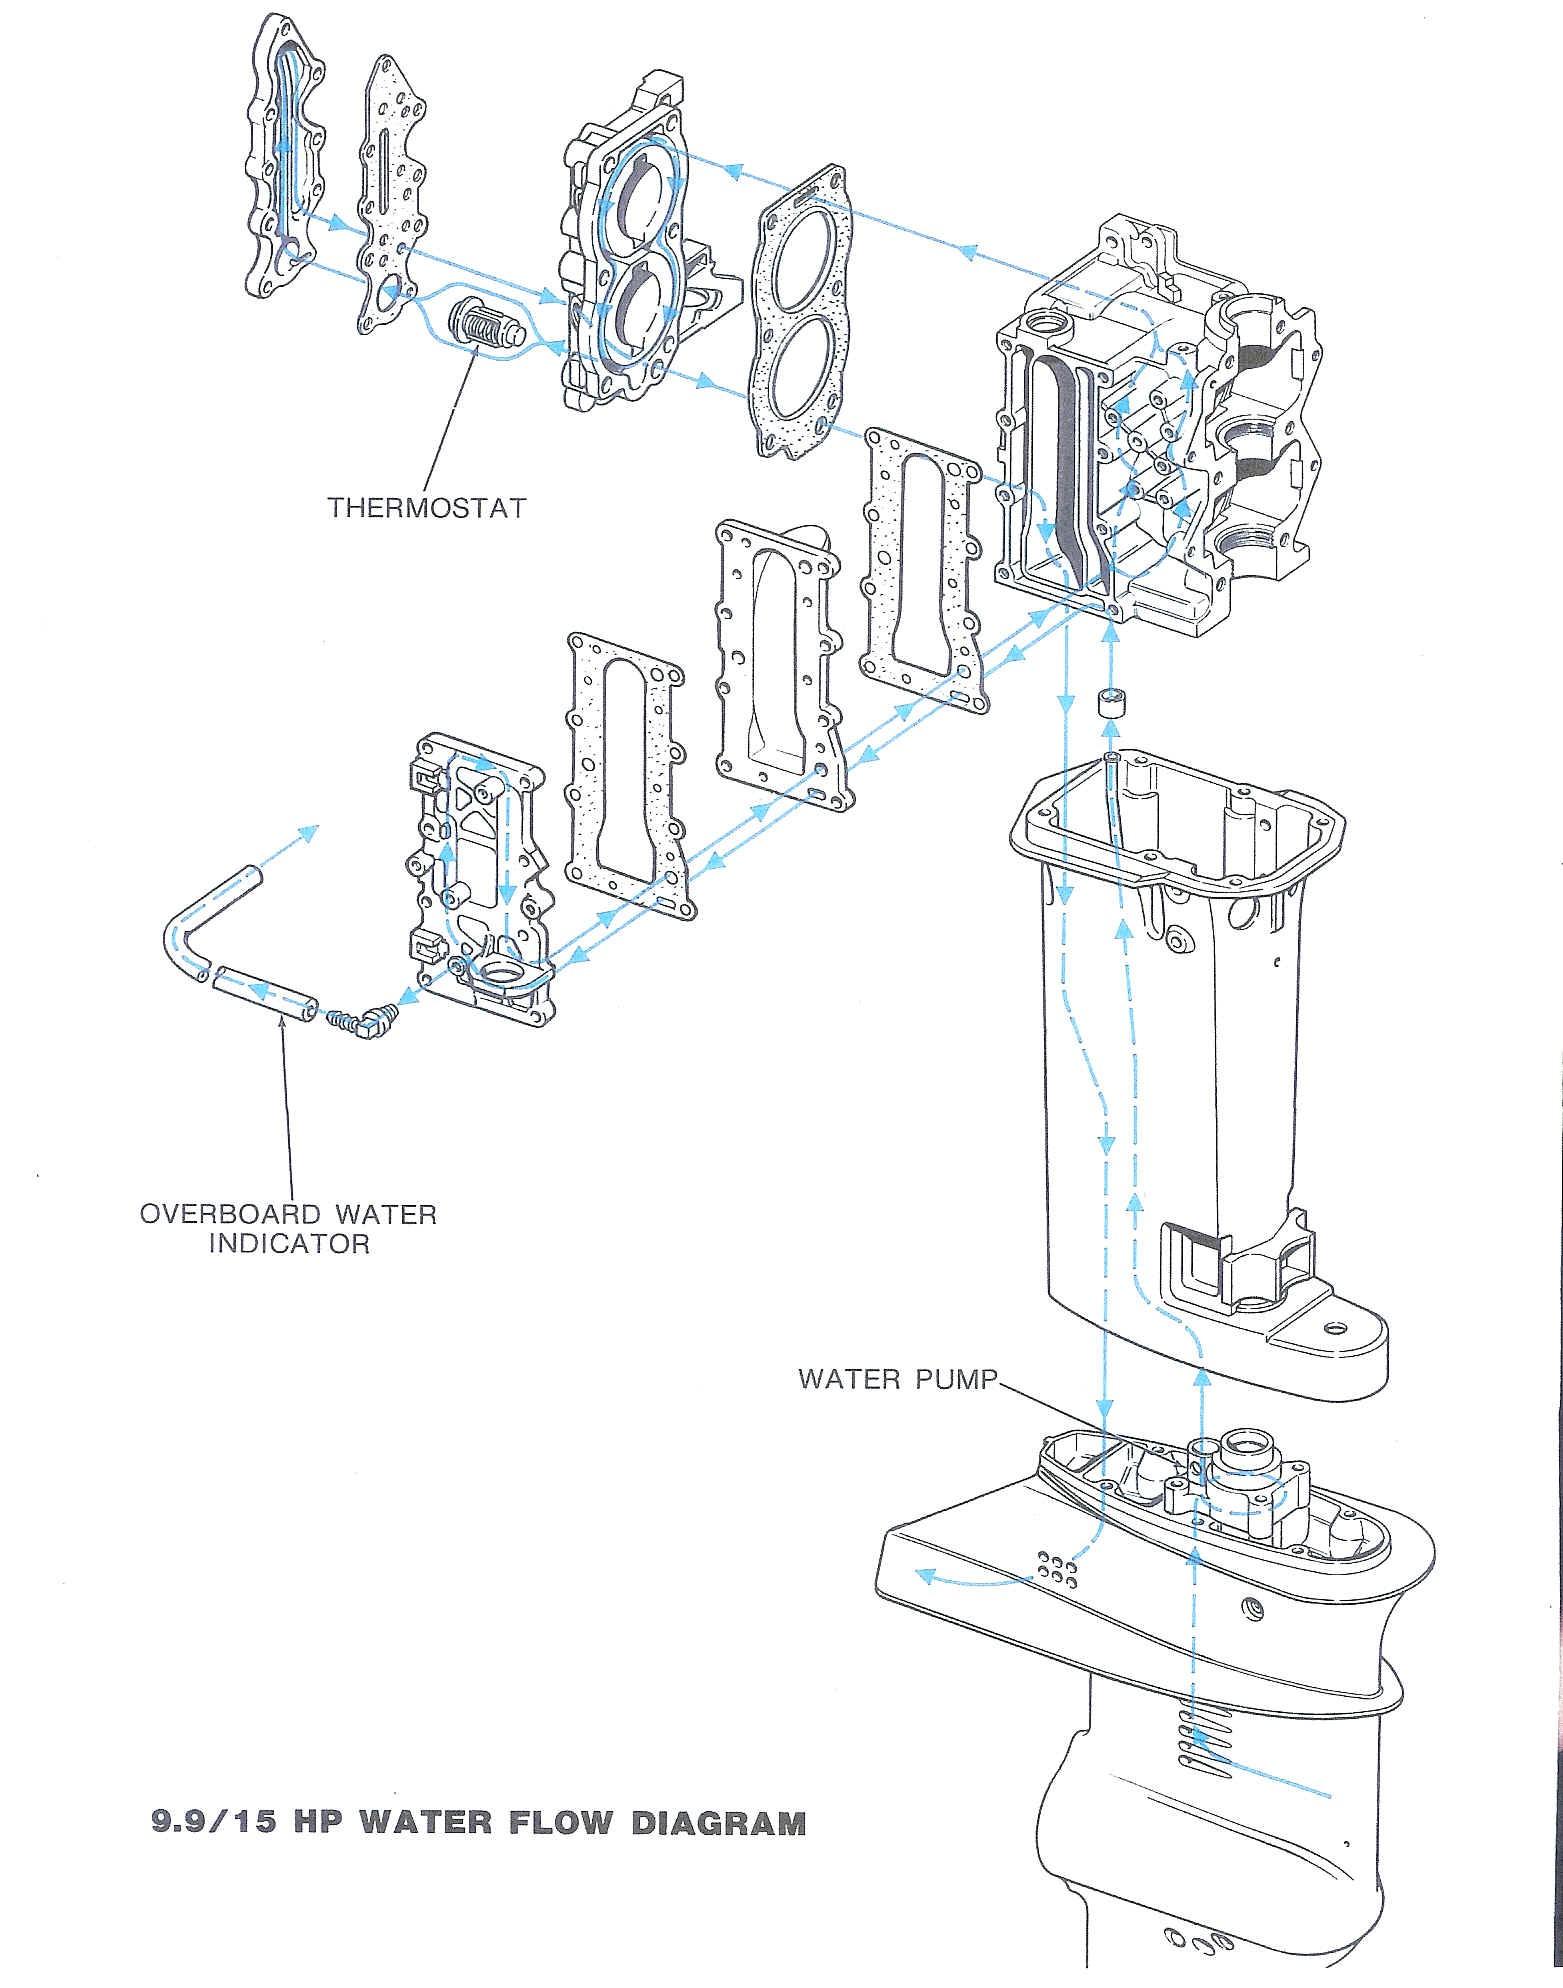 15 Hp Evinrude Parts Diagram Maintaining Johnson Evinrude 9 9 Part 1 Of 15 Hp Evinrude Parts Diagram